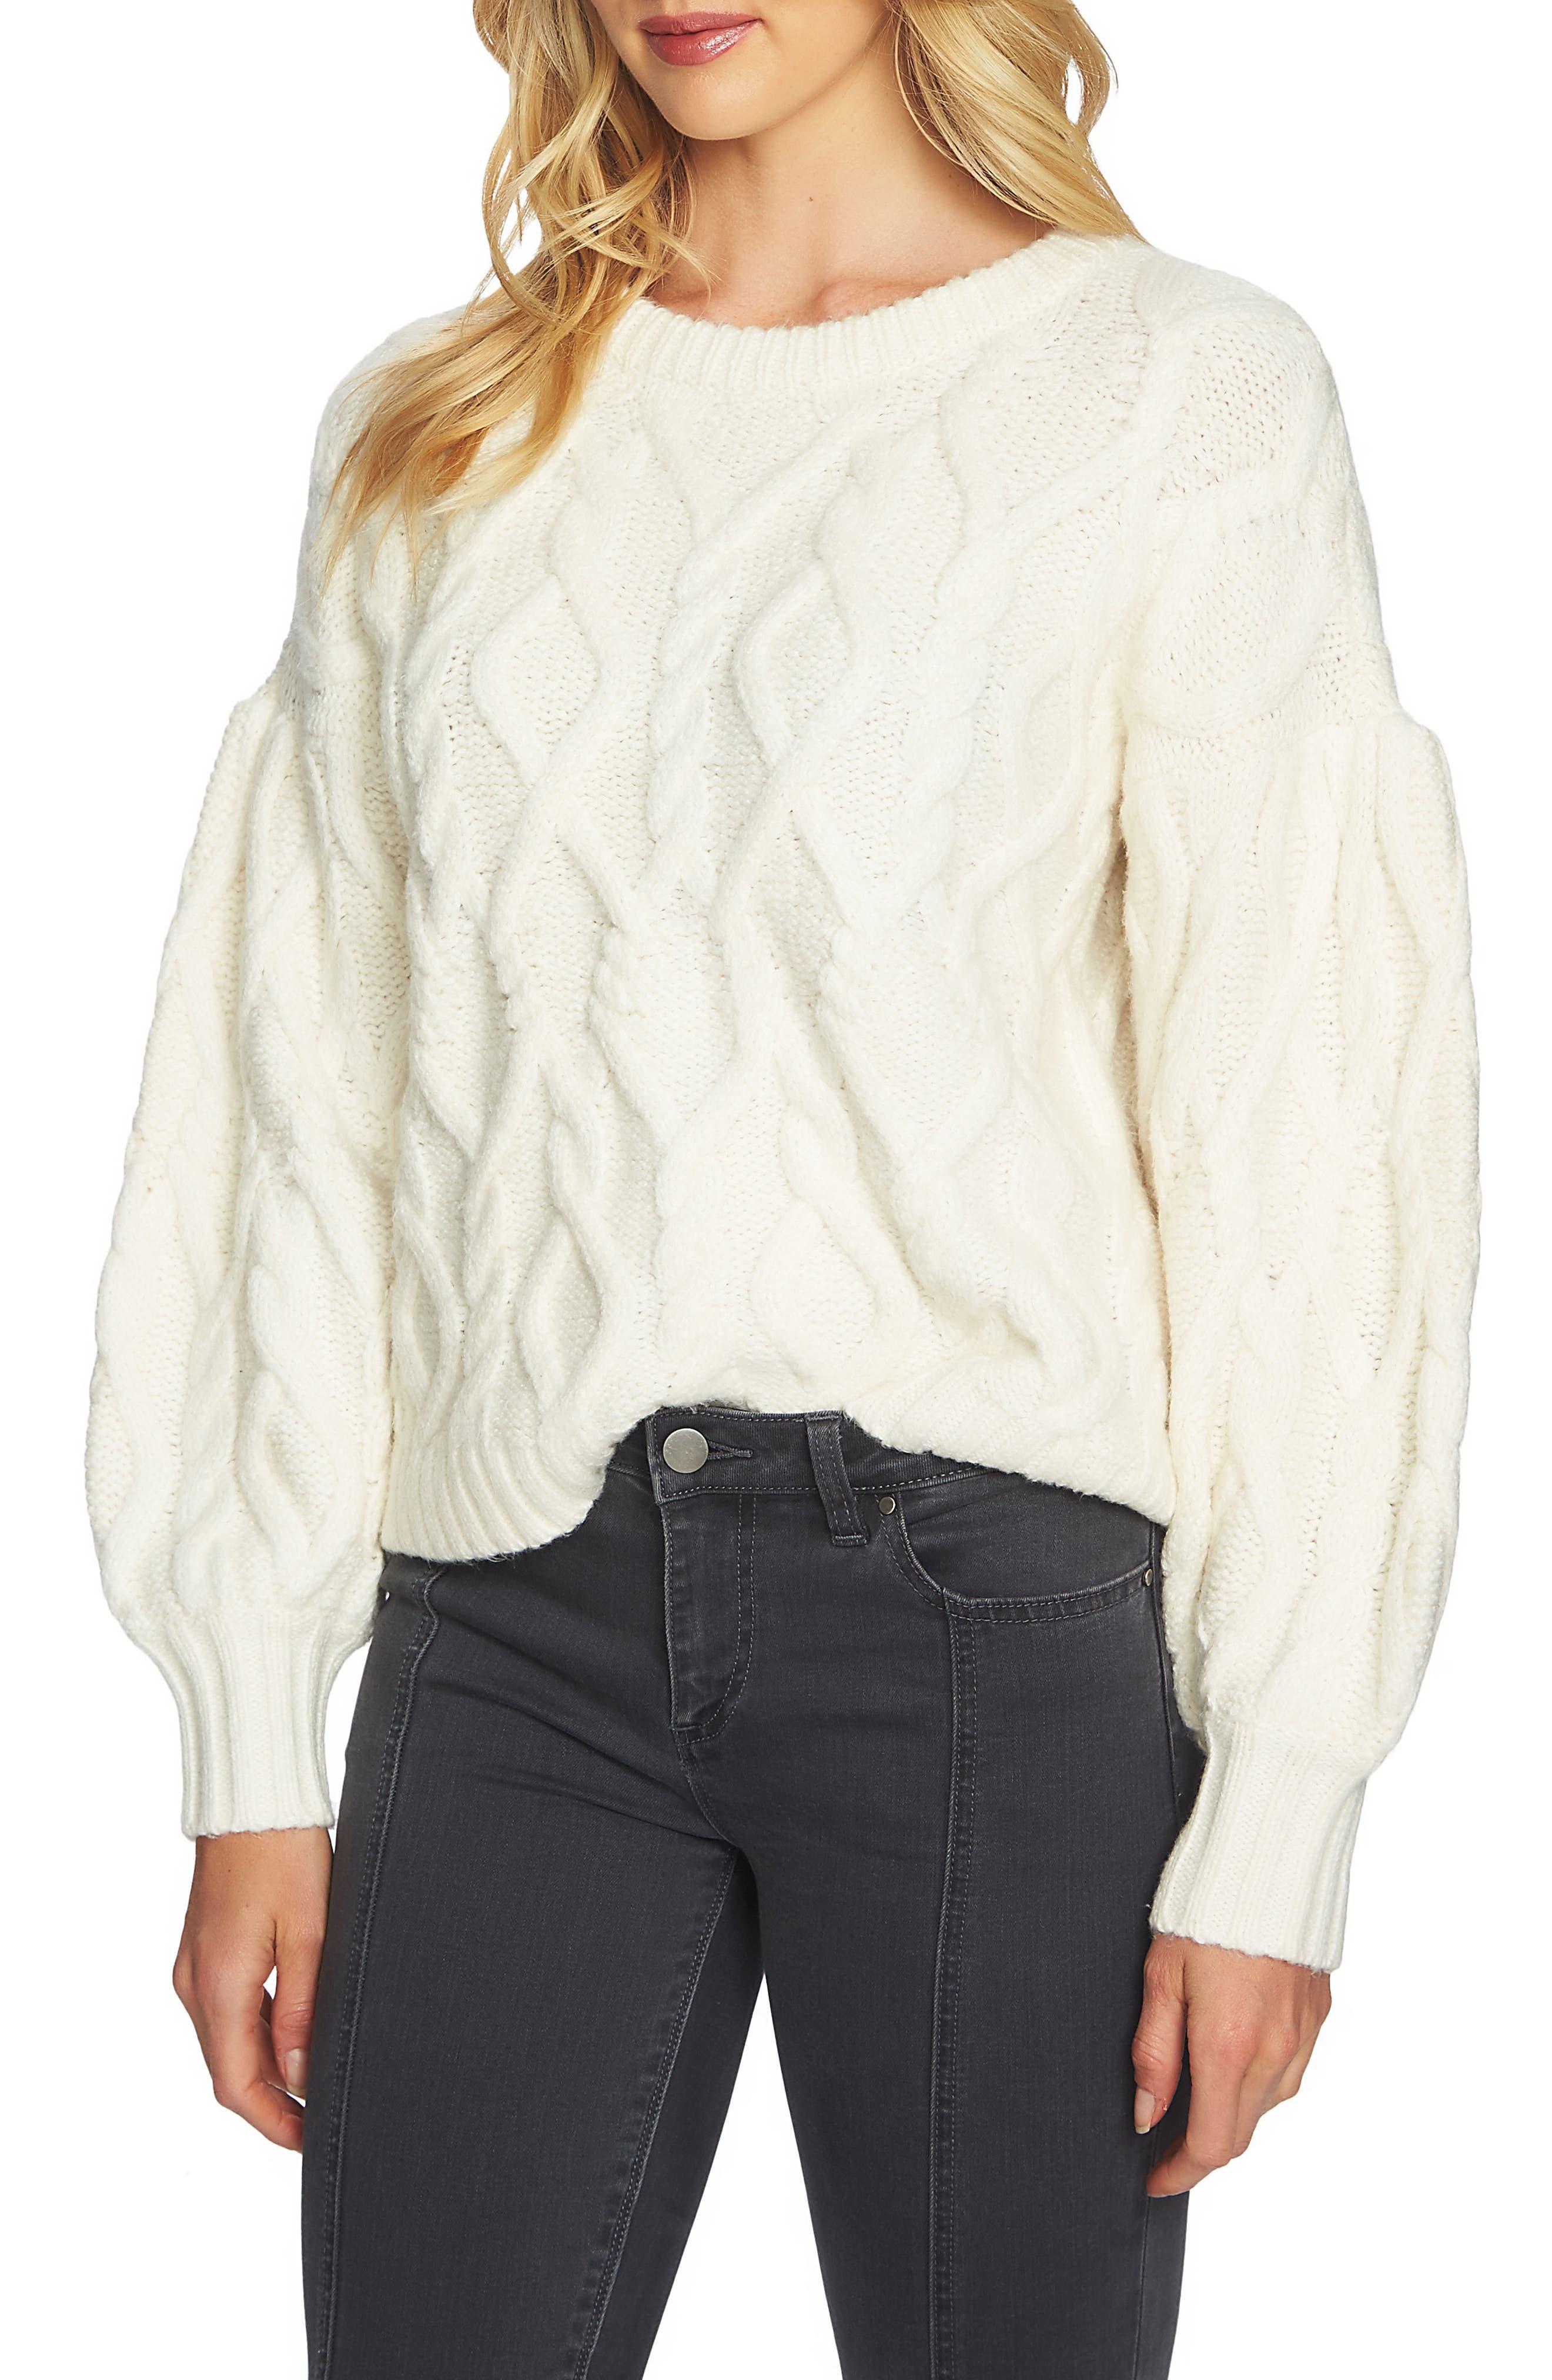 Main Image - 1.STATE Blouson Sleeve Sweater